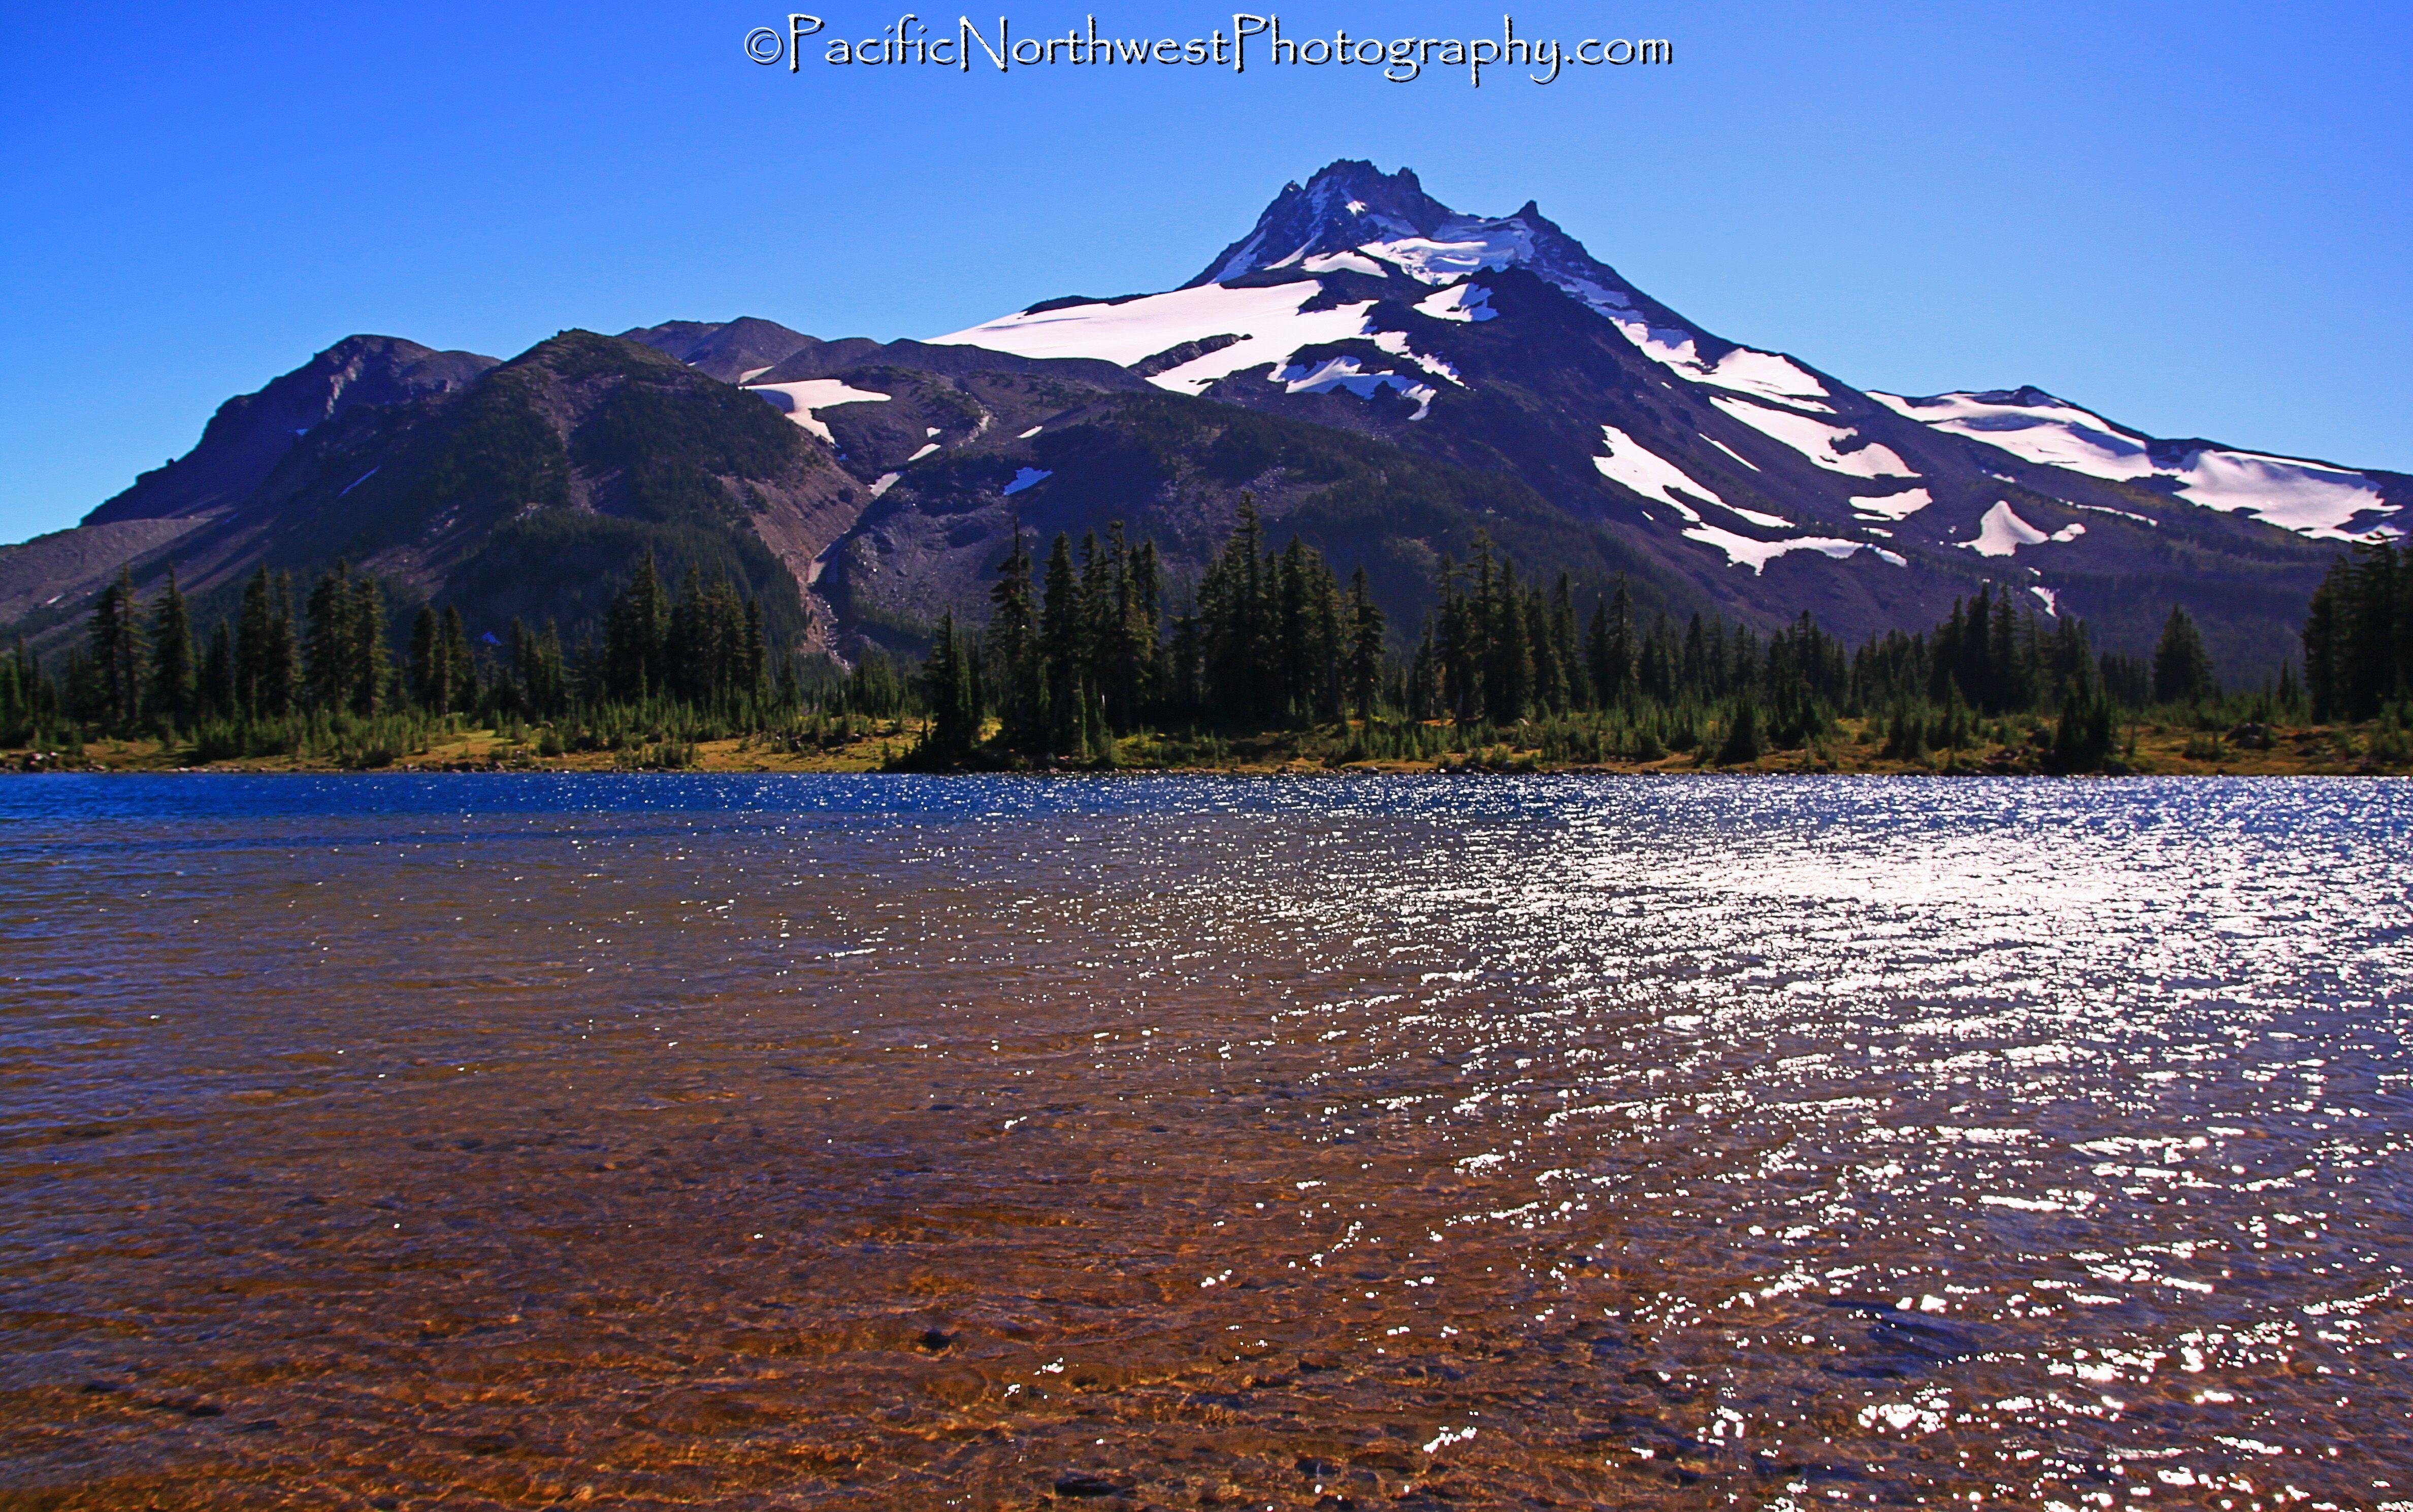 Alpine lake and Volcano